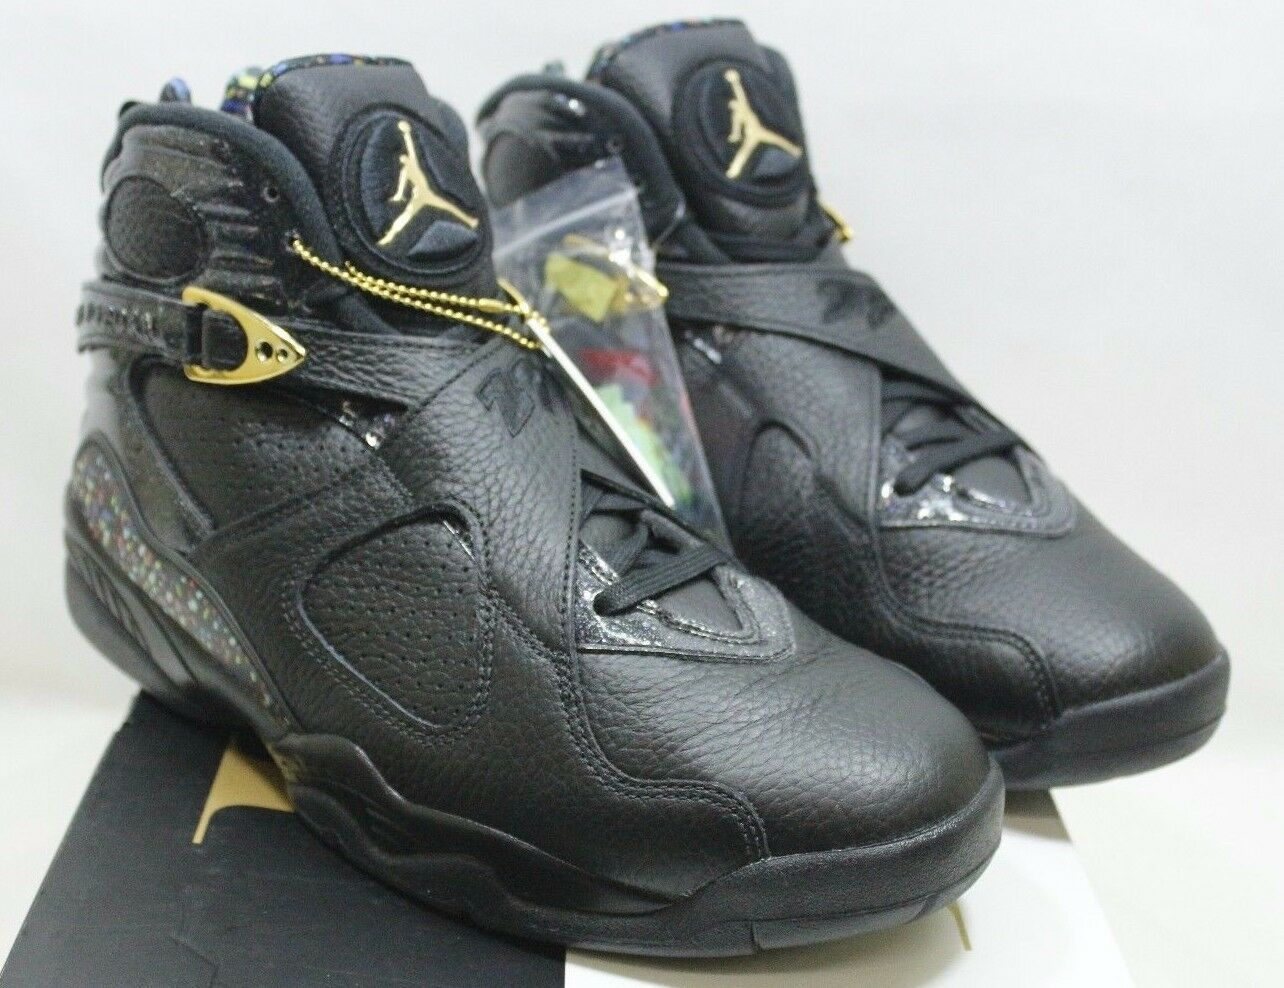 Nike air jordan 8 uomini retrò c & c nero / oro metallico 832821-004 sz